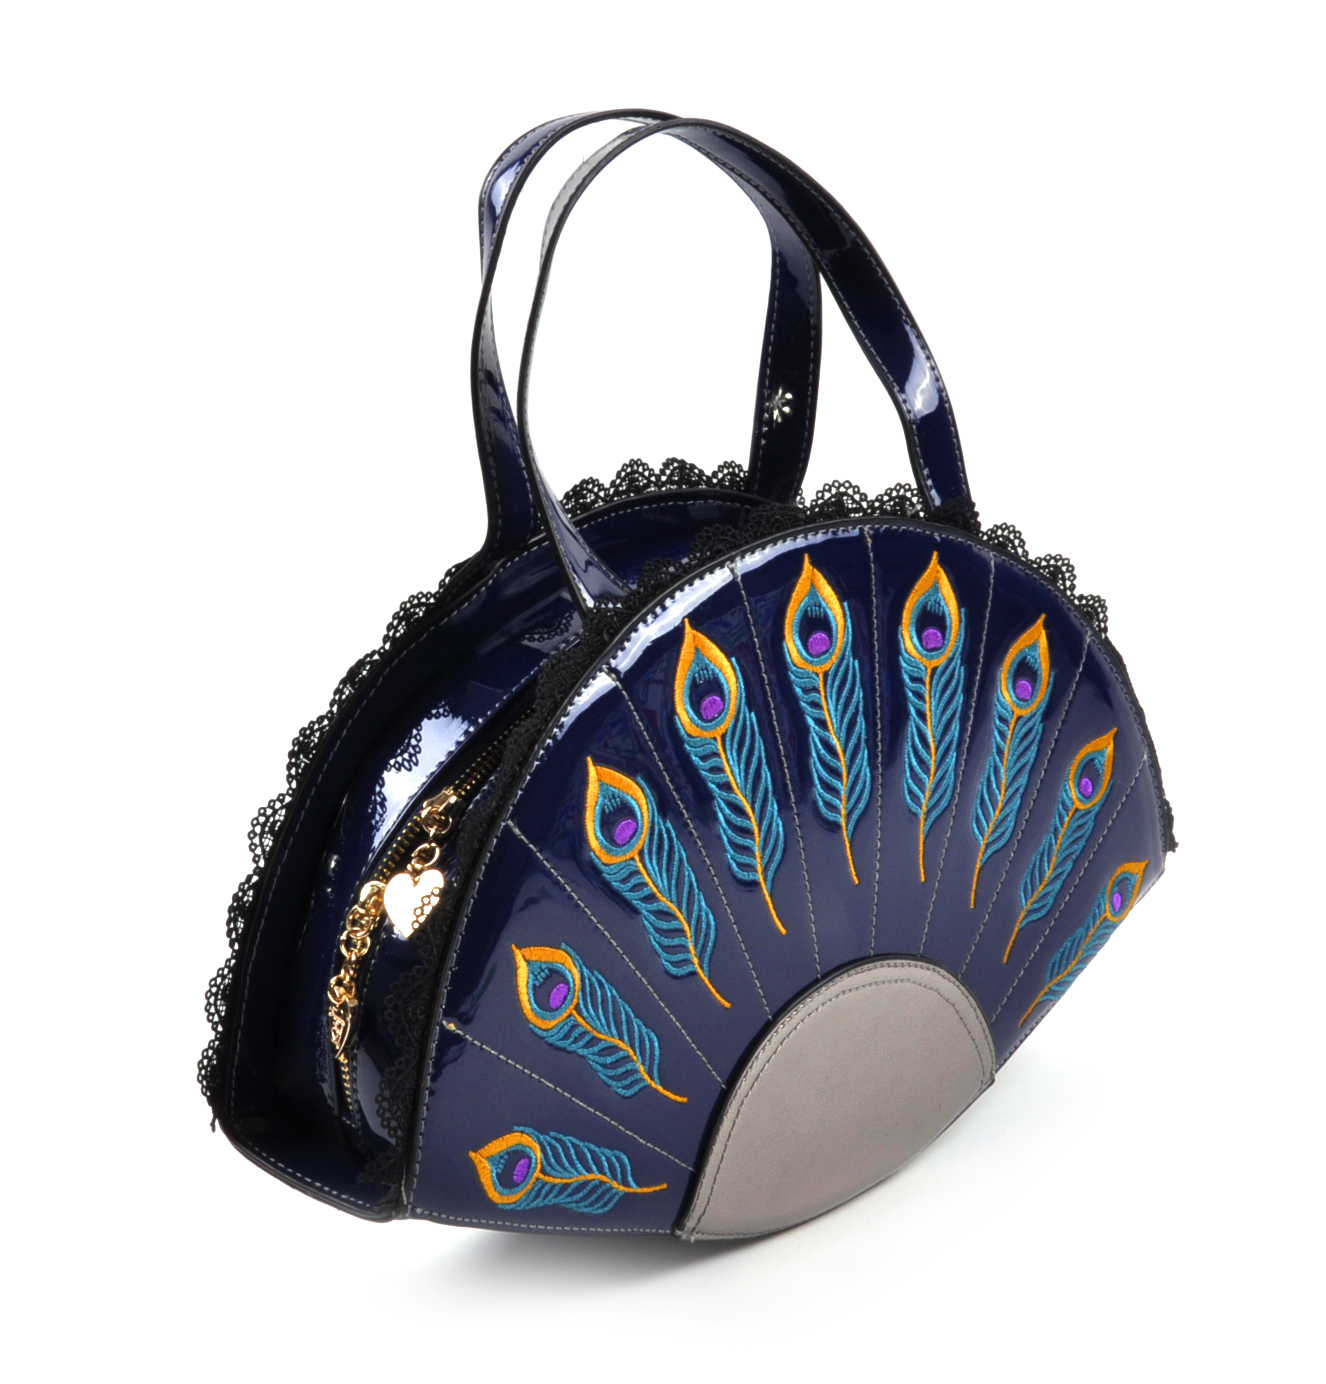 Peacock Hand Bag